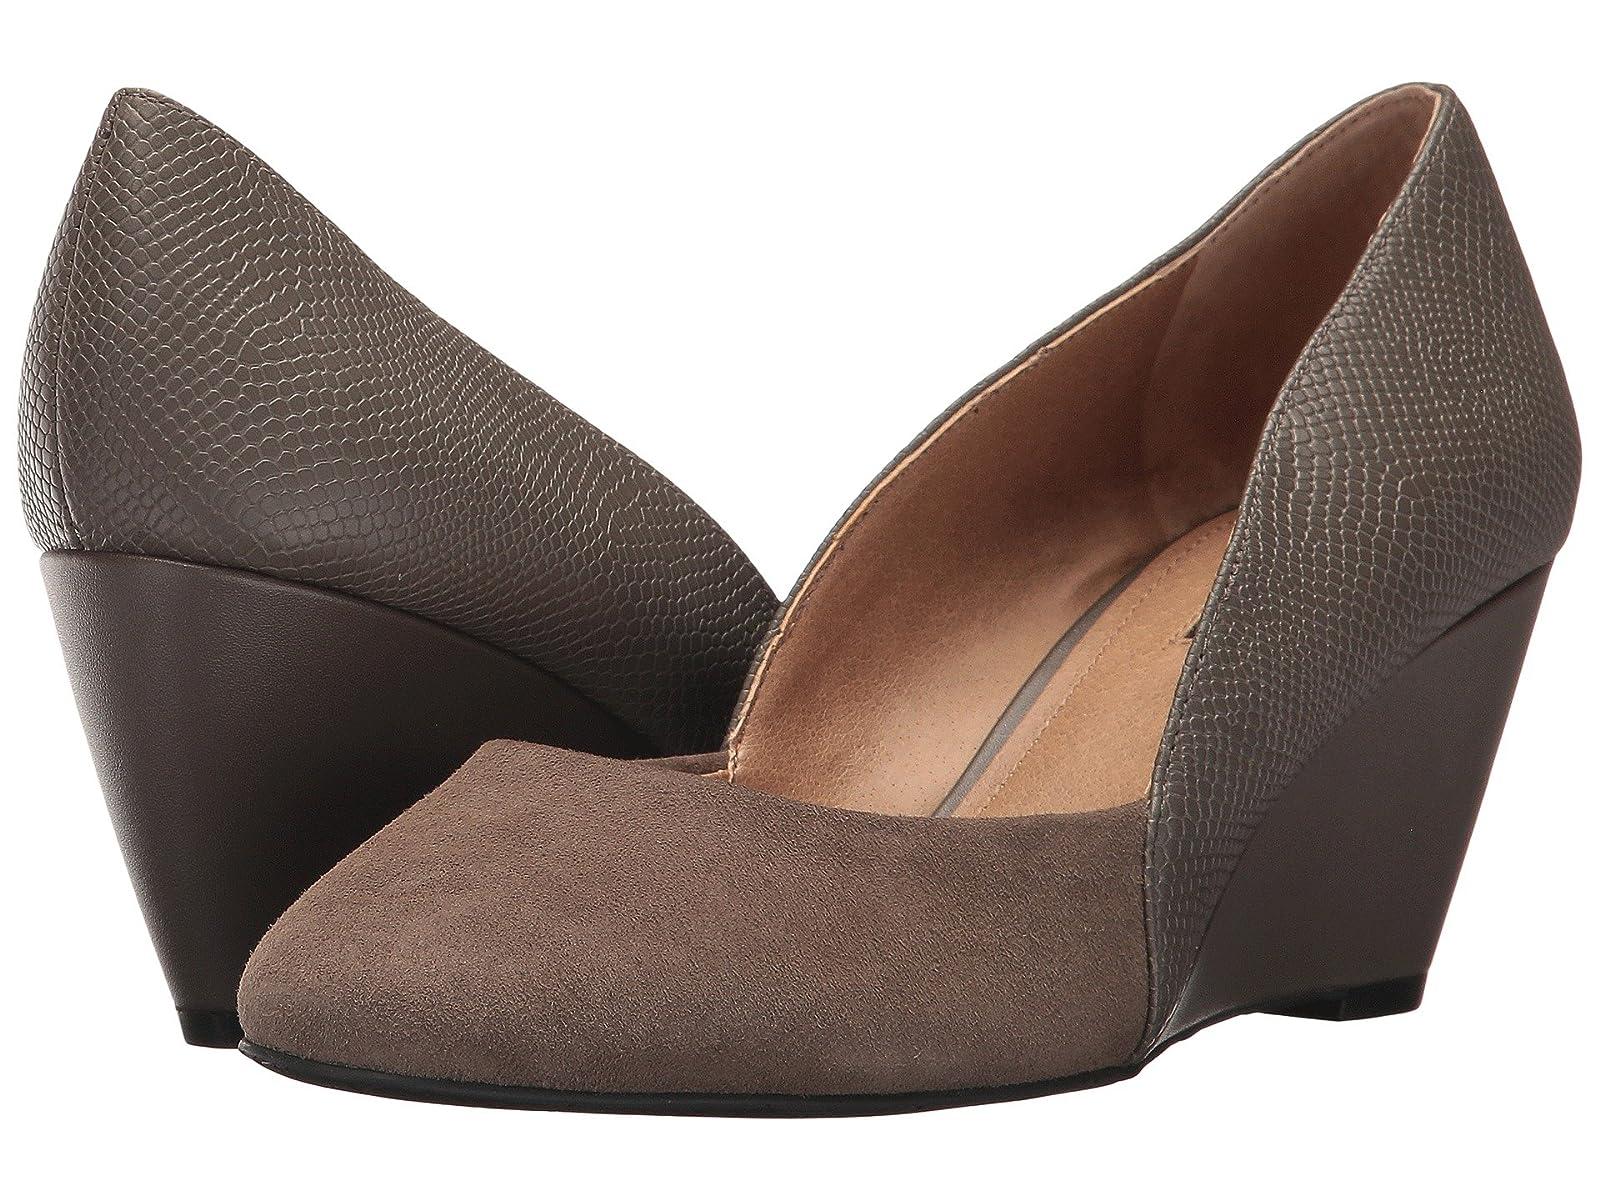 Tahari PalaceCheap and distinctive eye-catching shoes